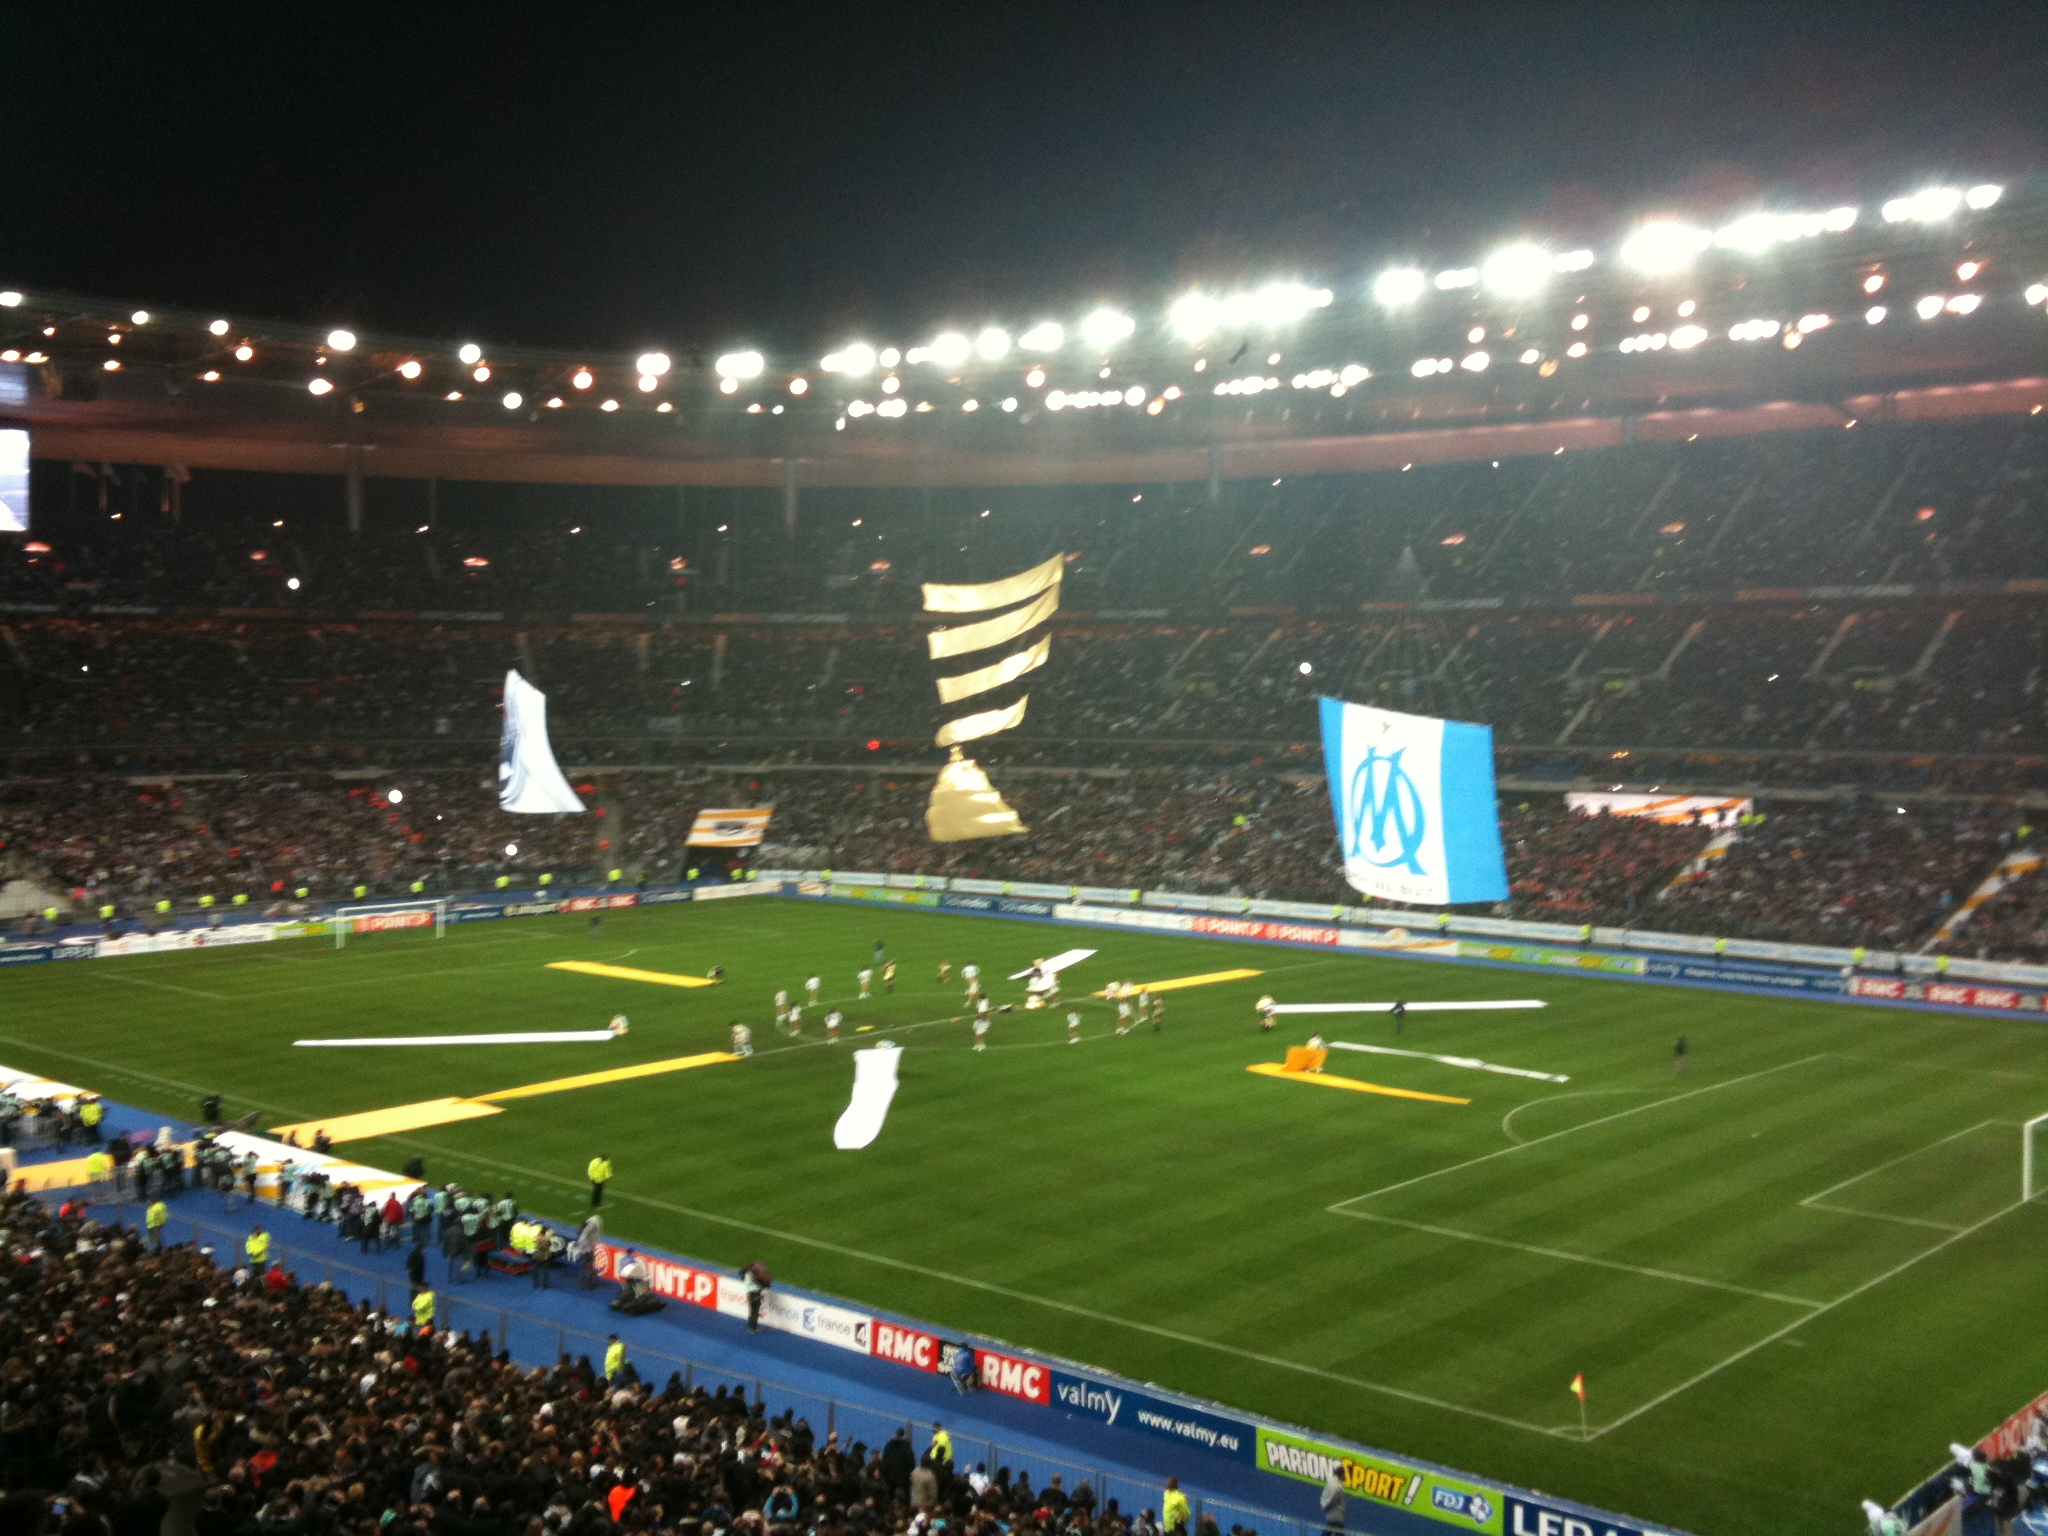 Photos ambiance stade de france marseille bordeaux coupe de la ligue - Stade de france coupe de la ligue ...